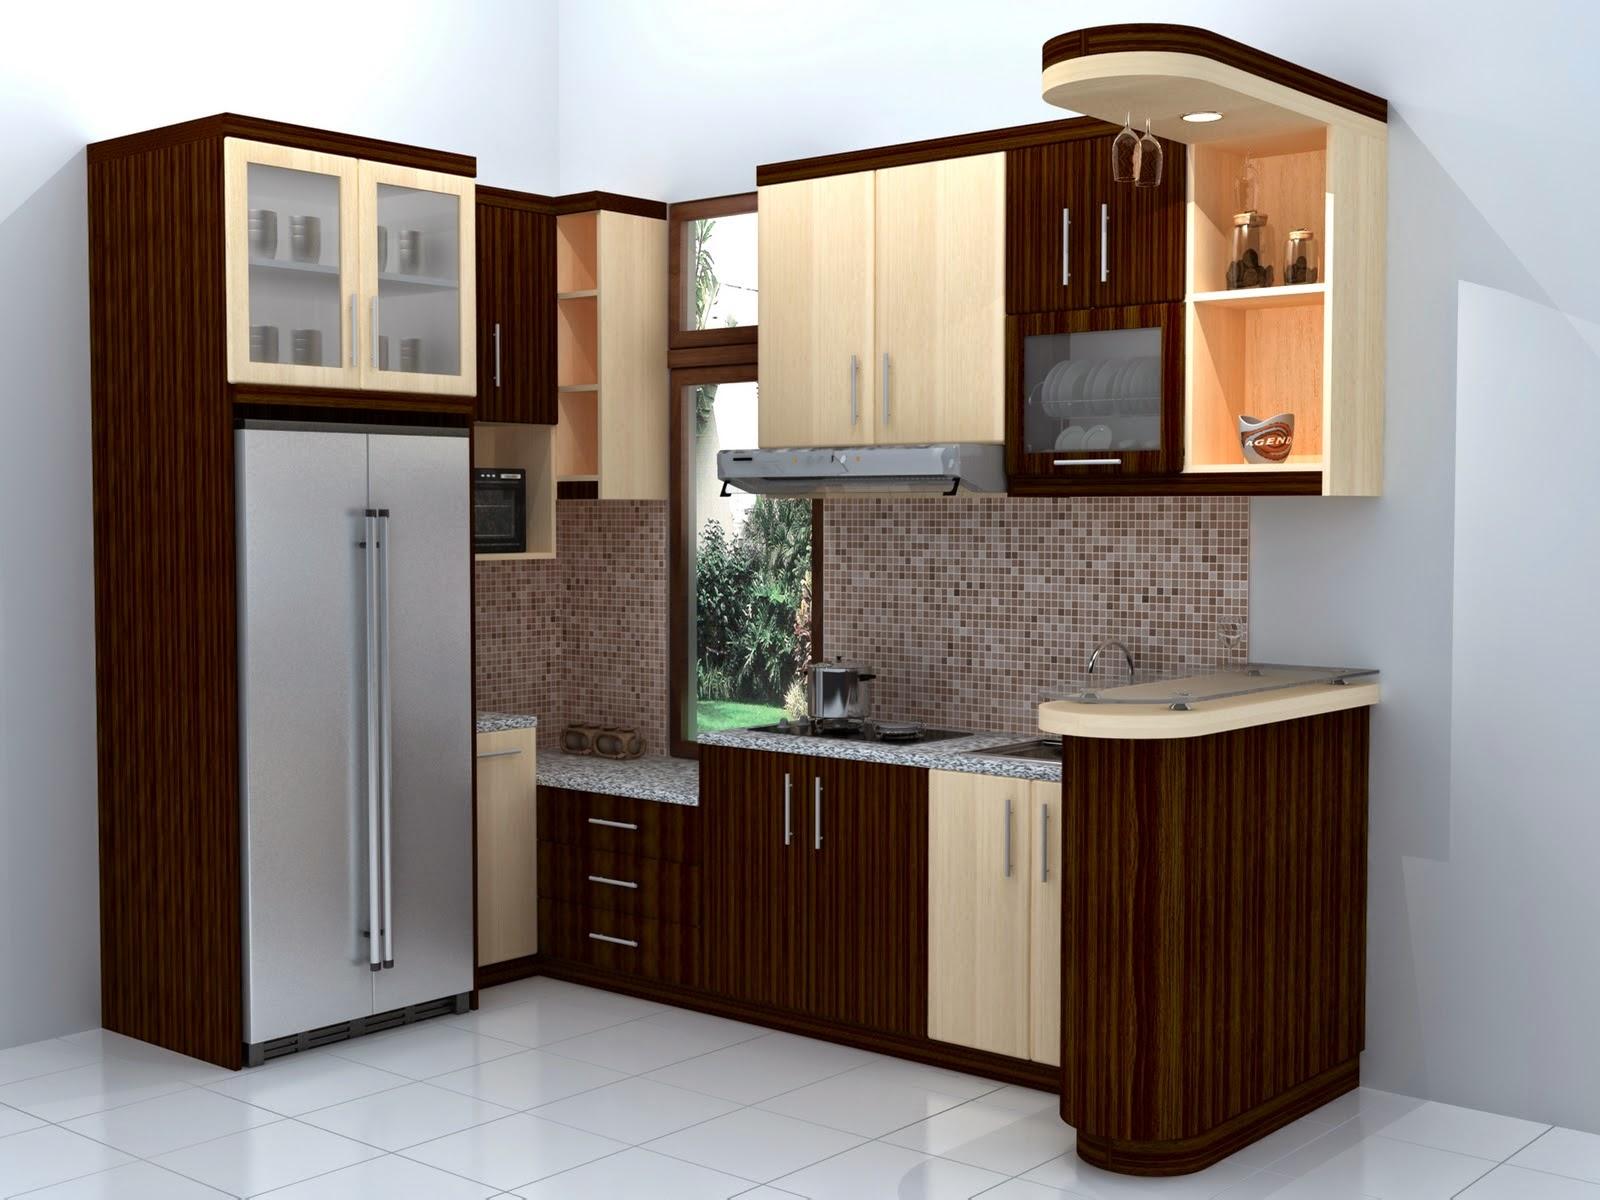 gambar dapur rumah kecil sederhana